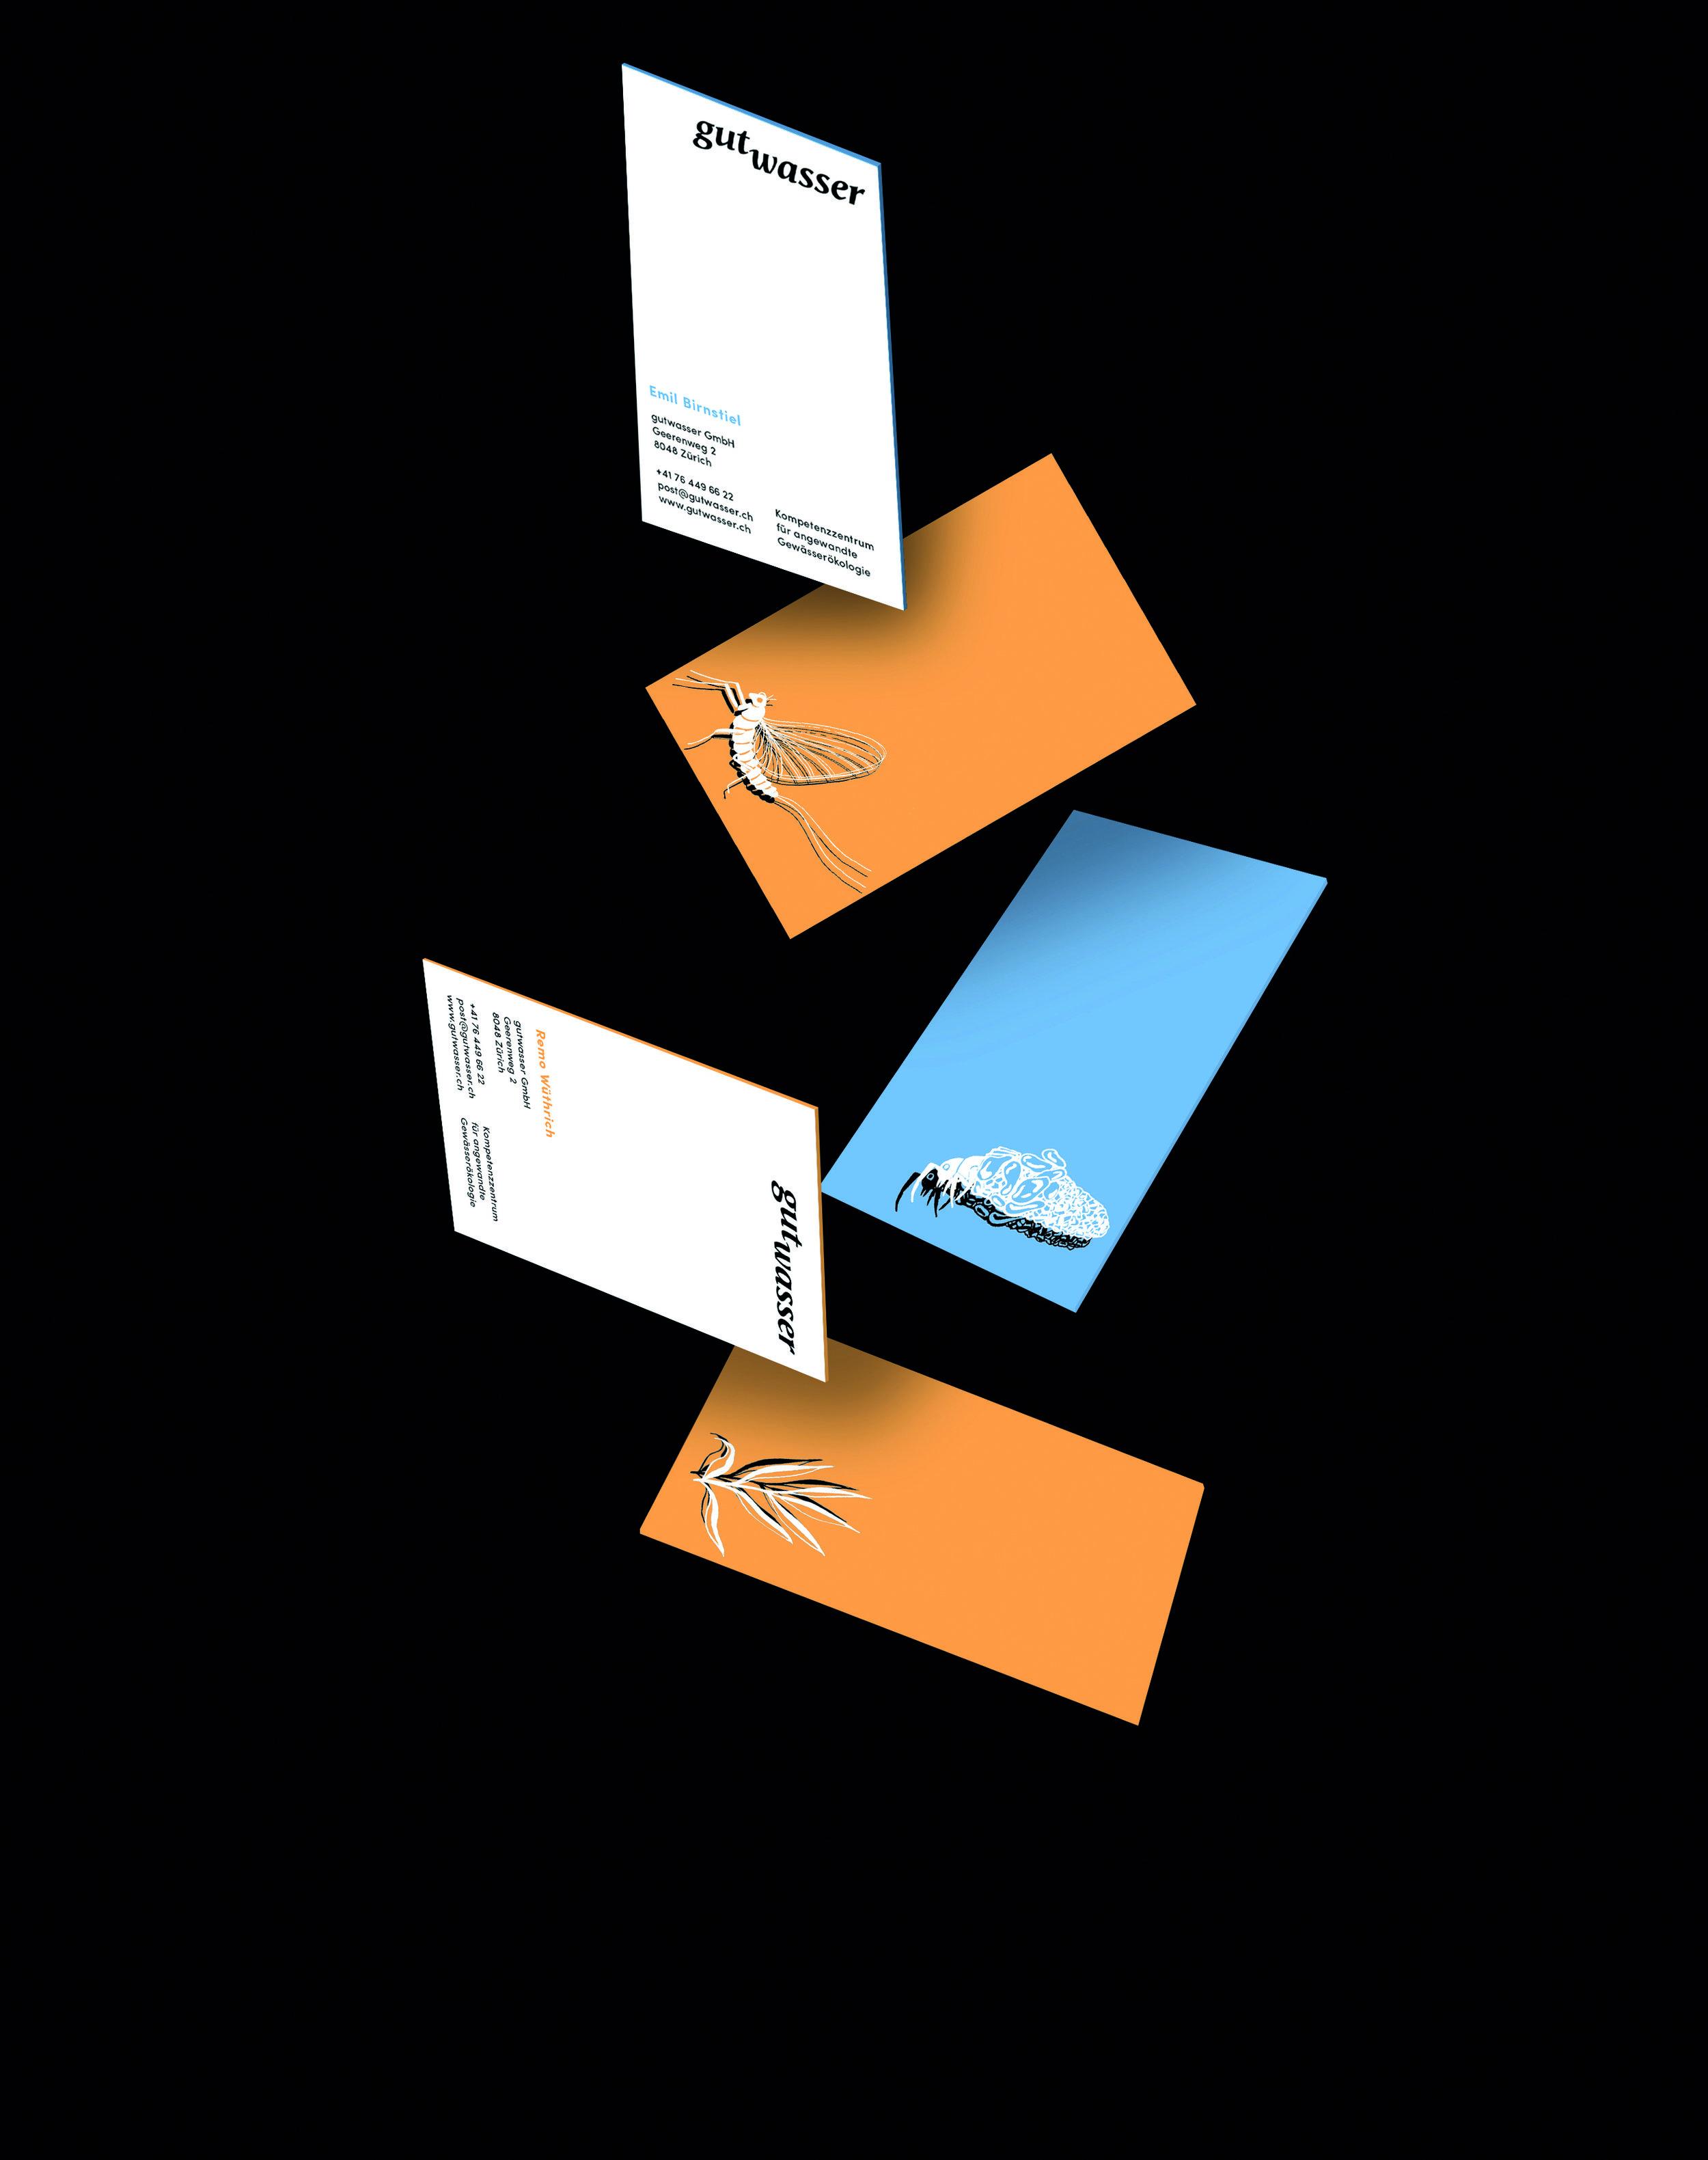 gutw cards.jpg